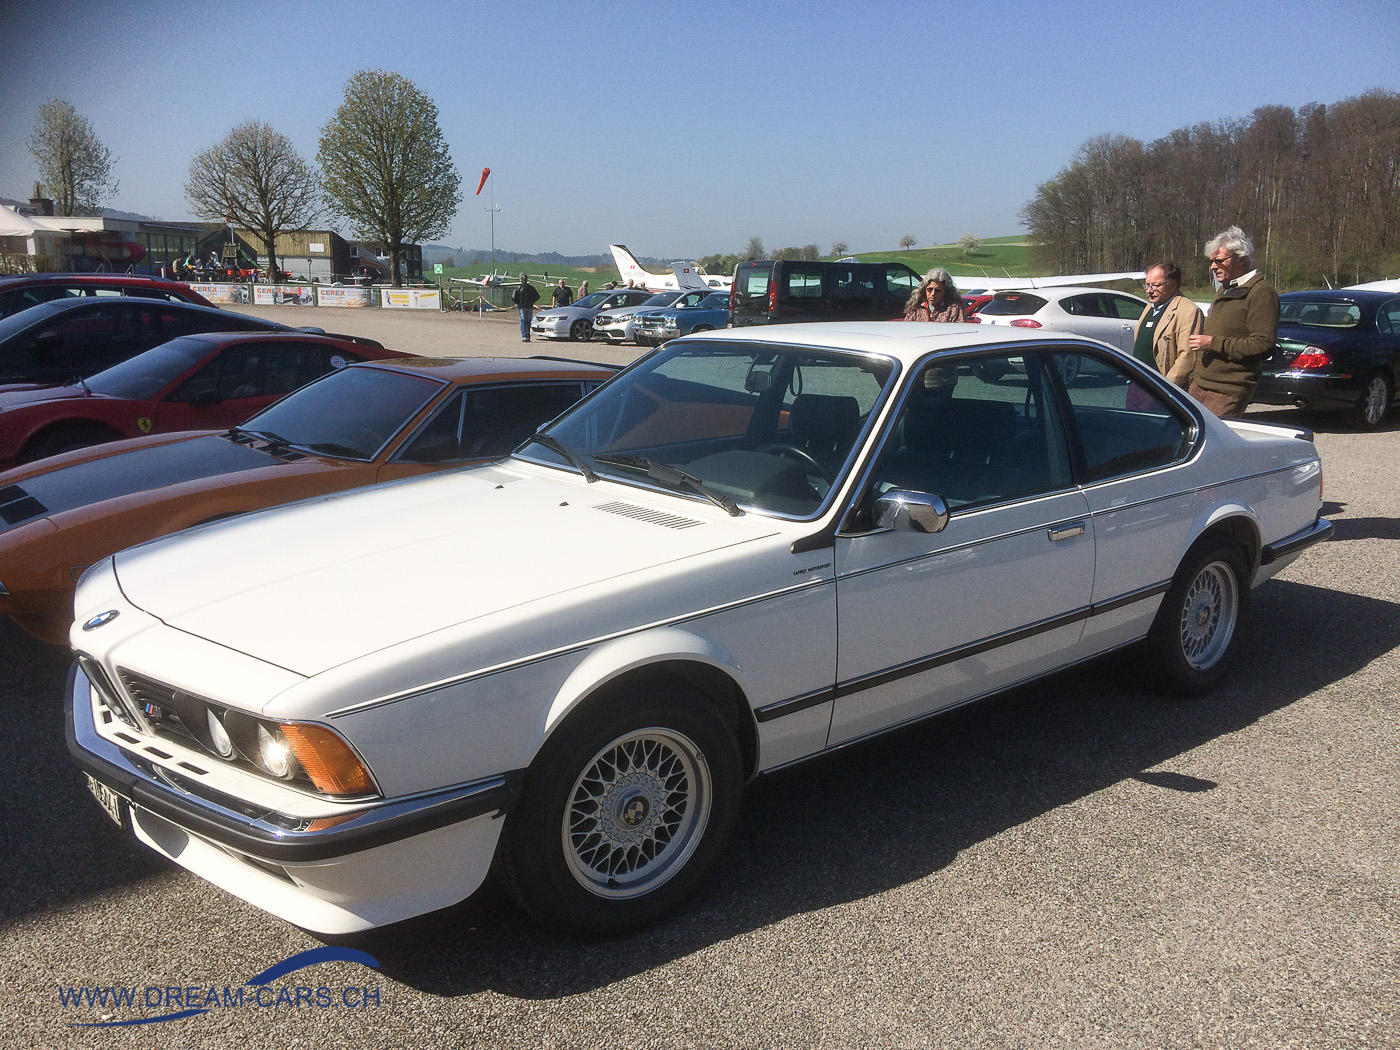 Dream-Cars Klassiker der Woche BMW M 635 CSI